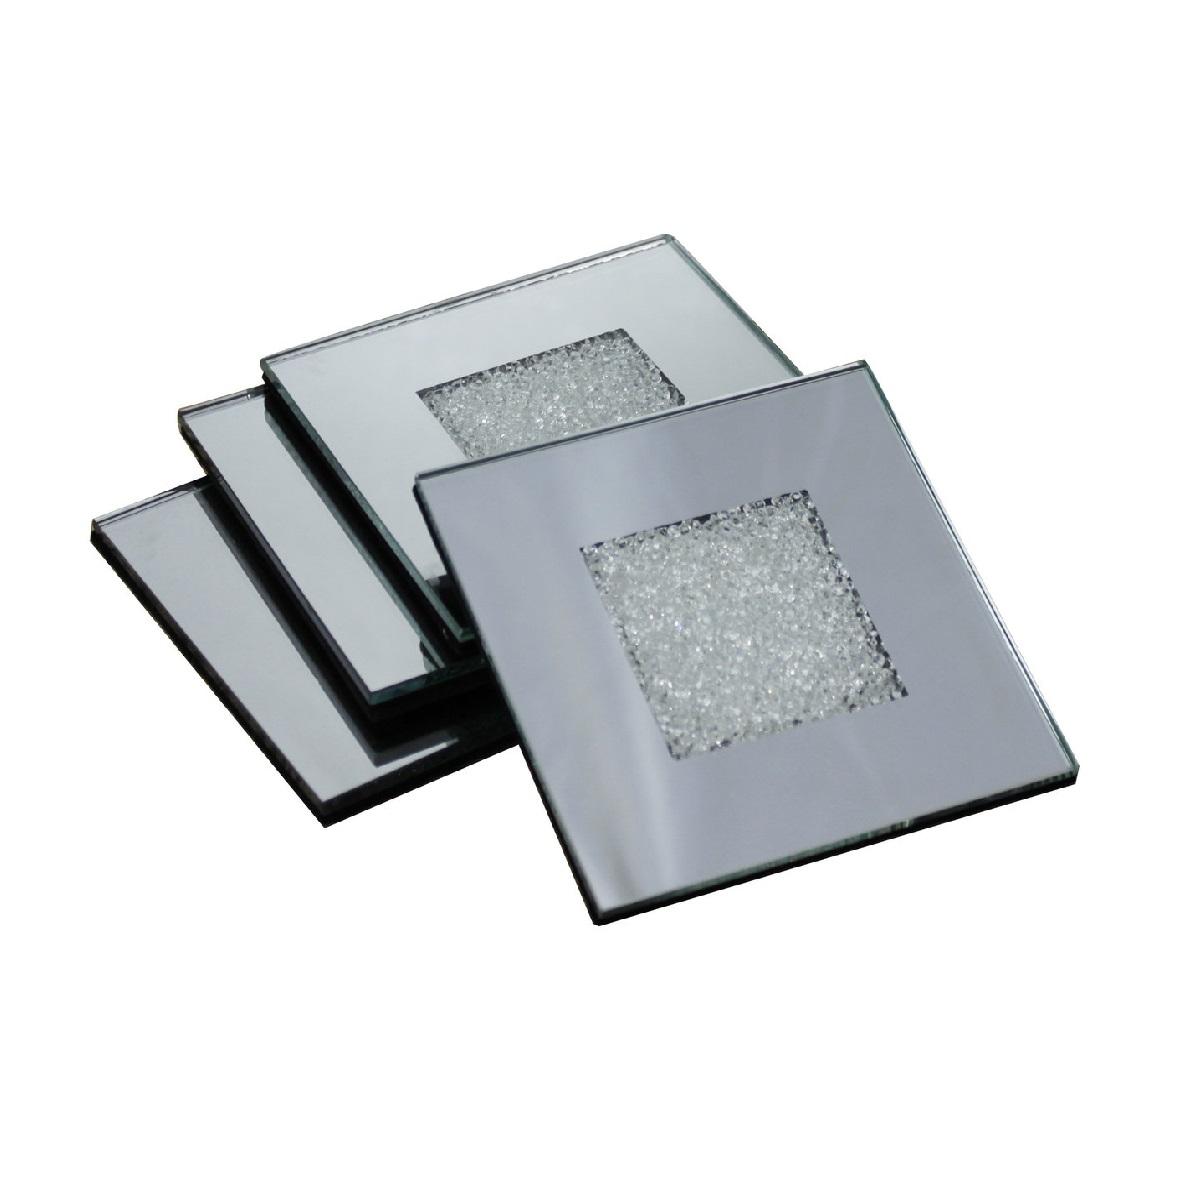 Swarovski Crystal Filled Mirrored Coasters Set Of 4